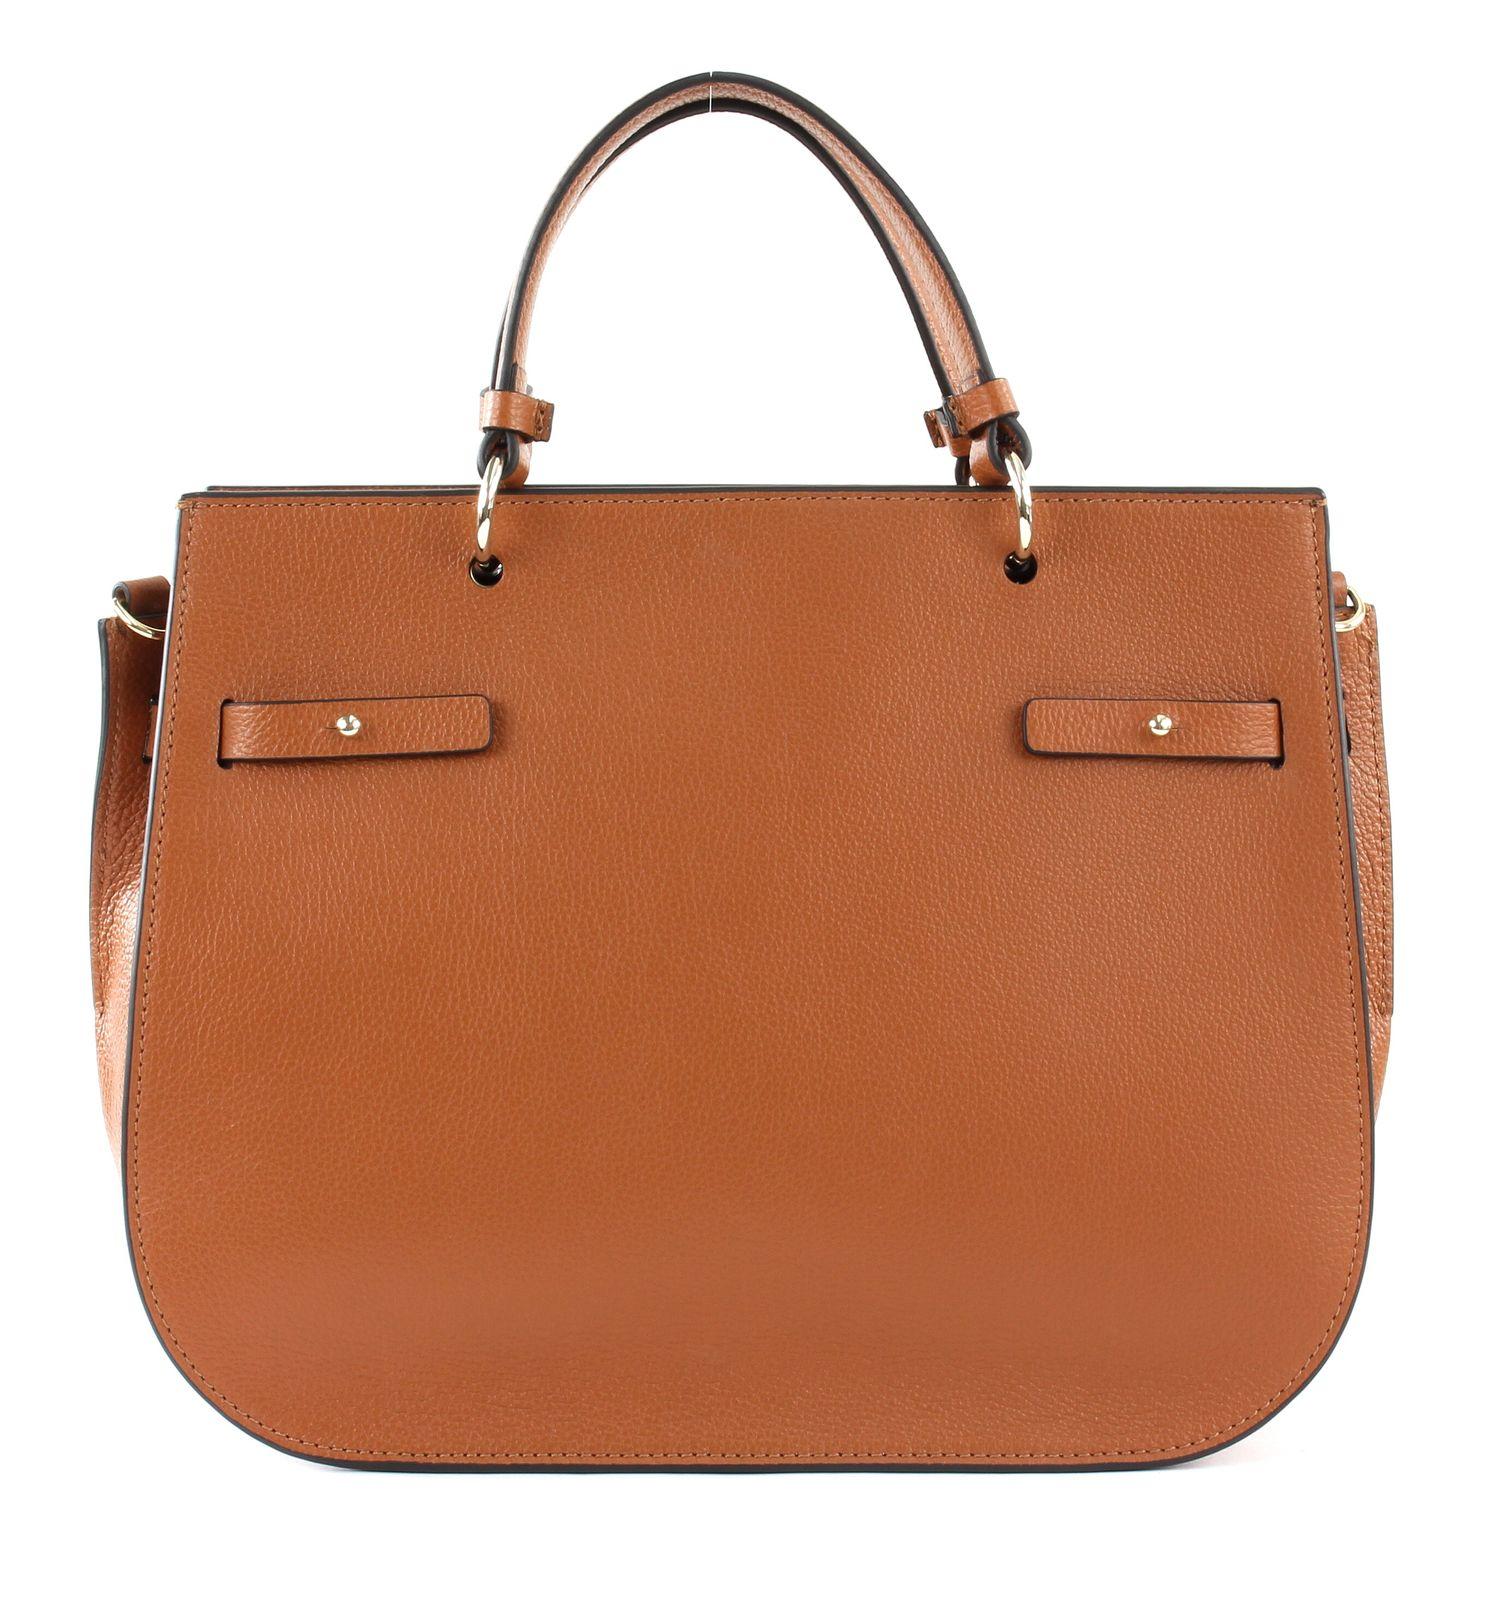 Caramel Coccinelle Didi Coccinelle Handbag Handbag Didi Coccinelle Handbag Didi Caramel 4Lj5AR